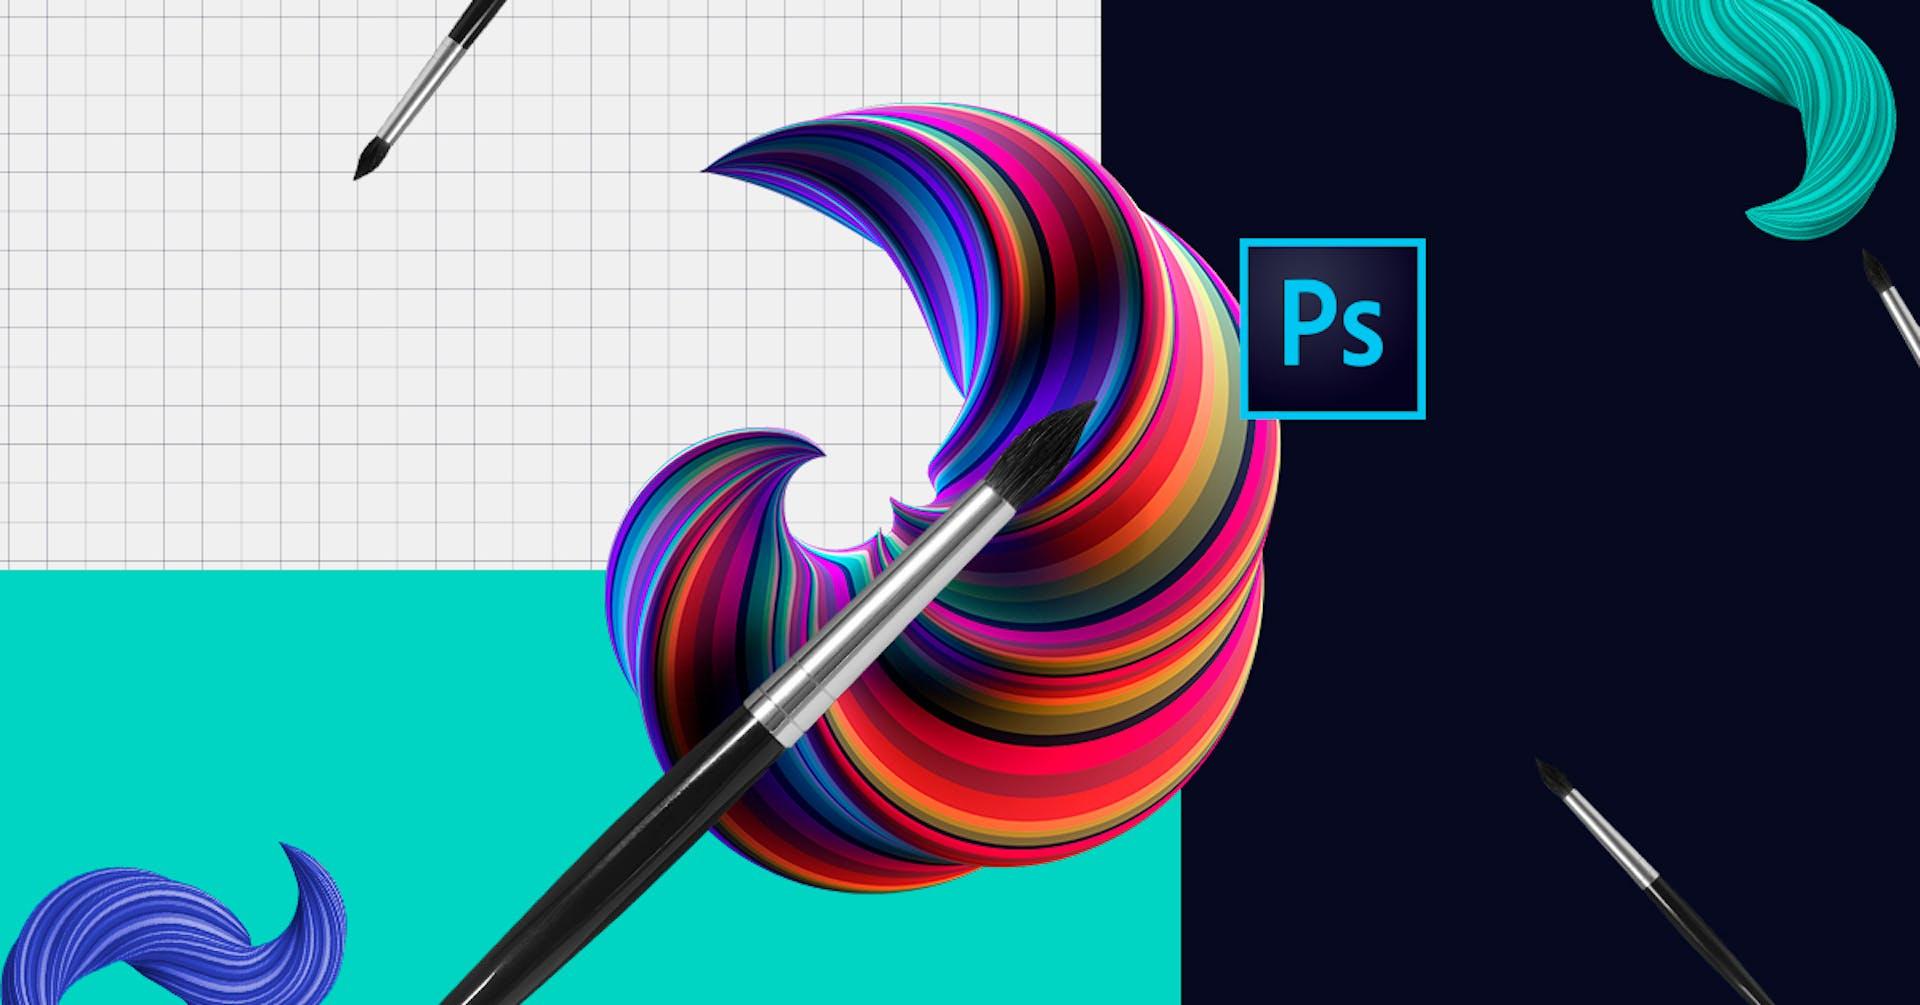 Con este pack gratis de pinceles para Photoshop tus diseños serán irresistibles